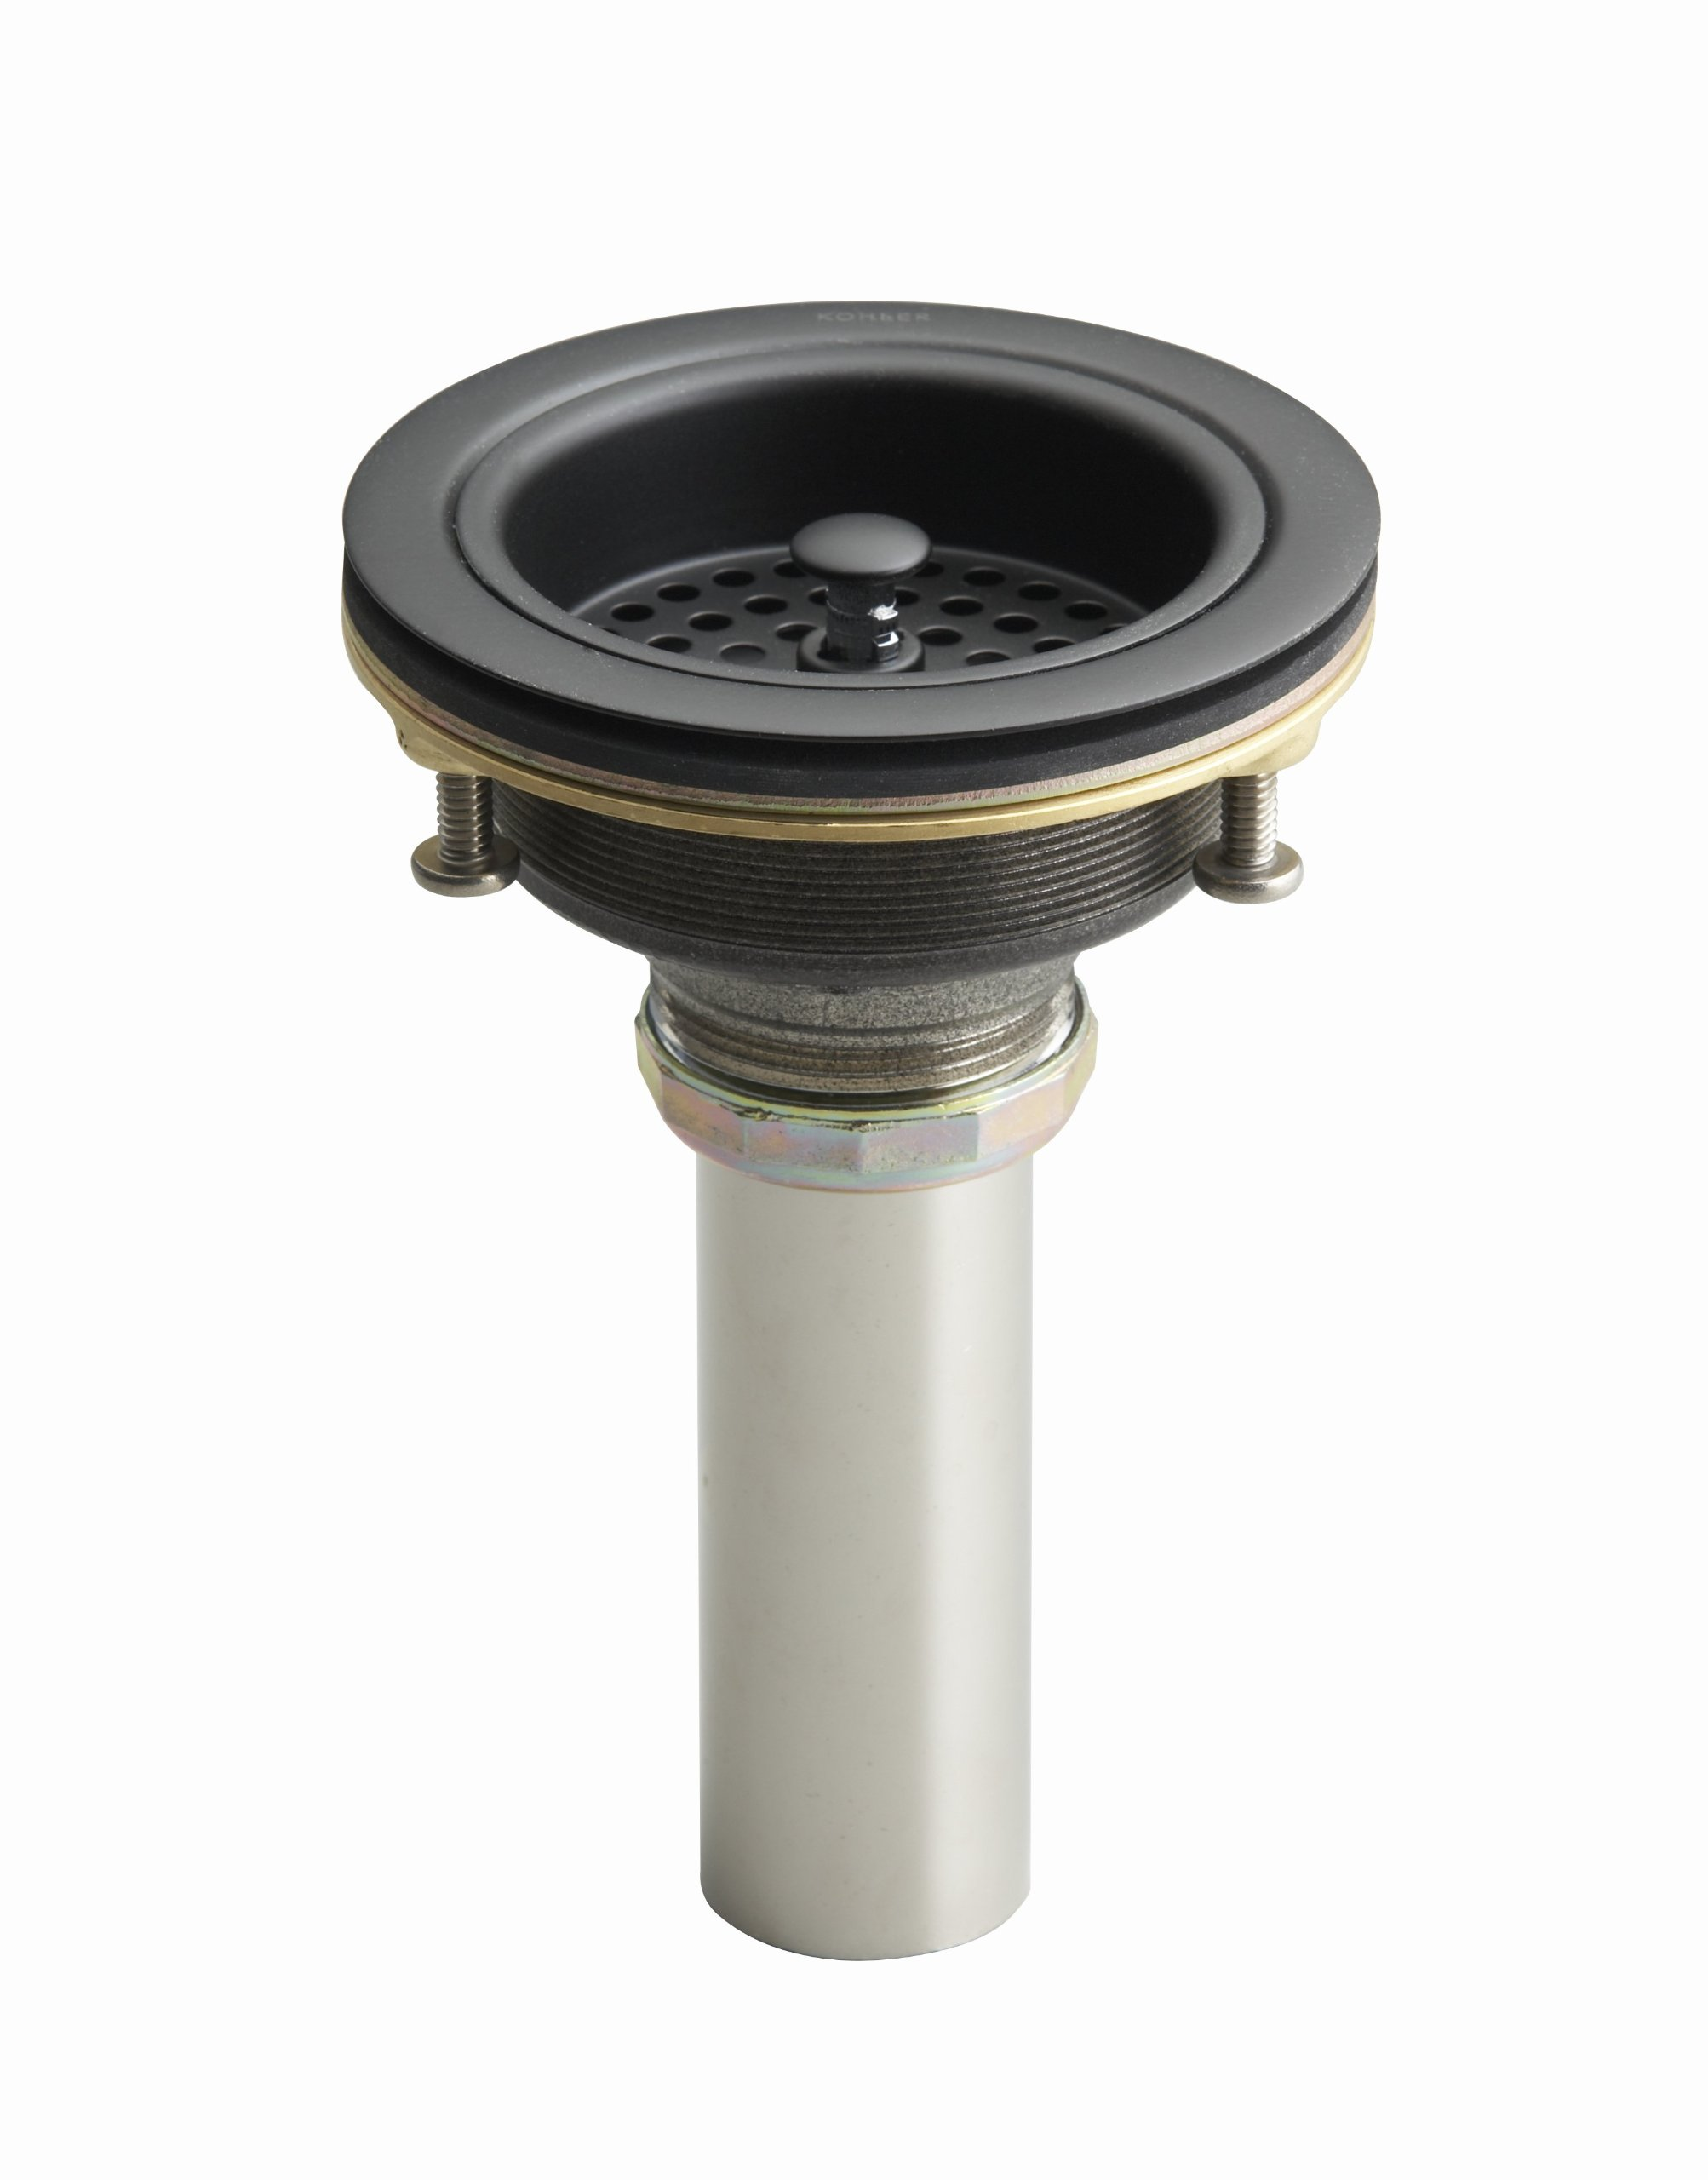 KOHLER K-8801-BRZ Duostrainer Sink Strainer, Oil-Rubbed Bronze